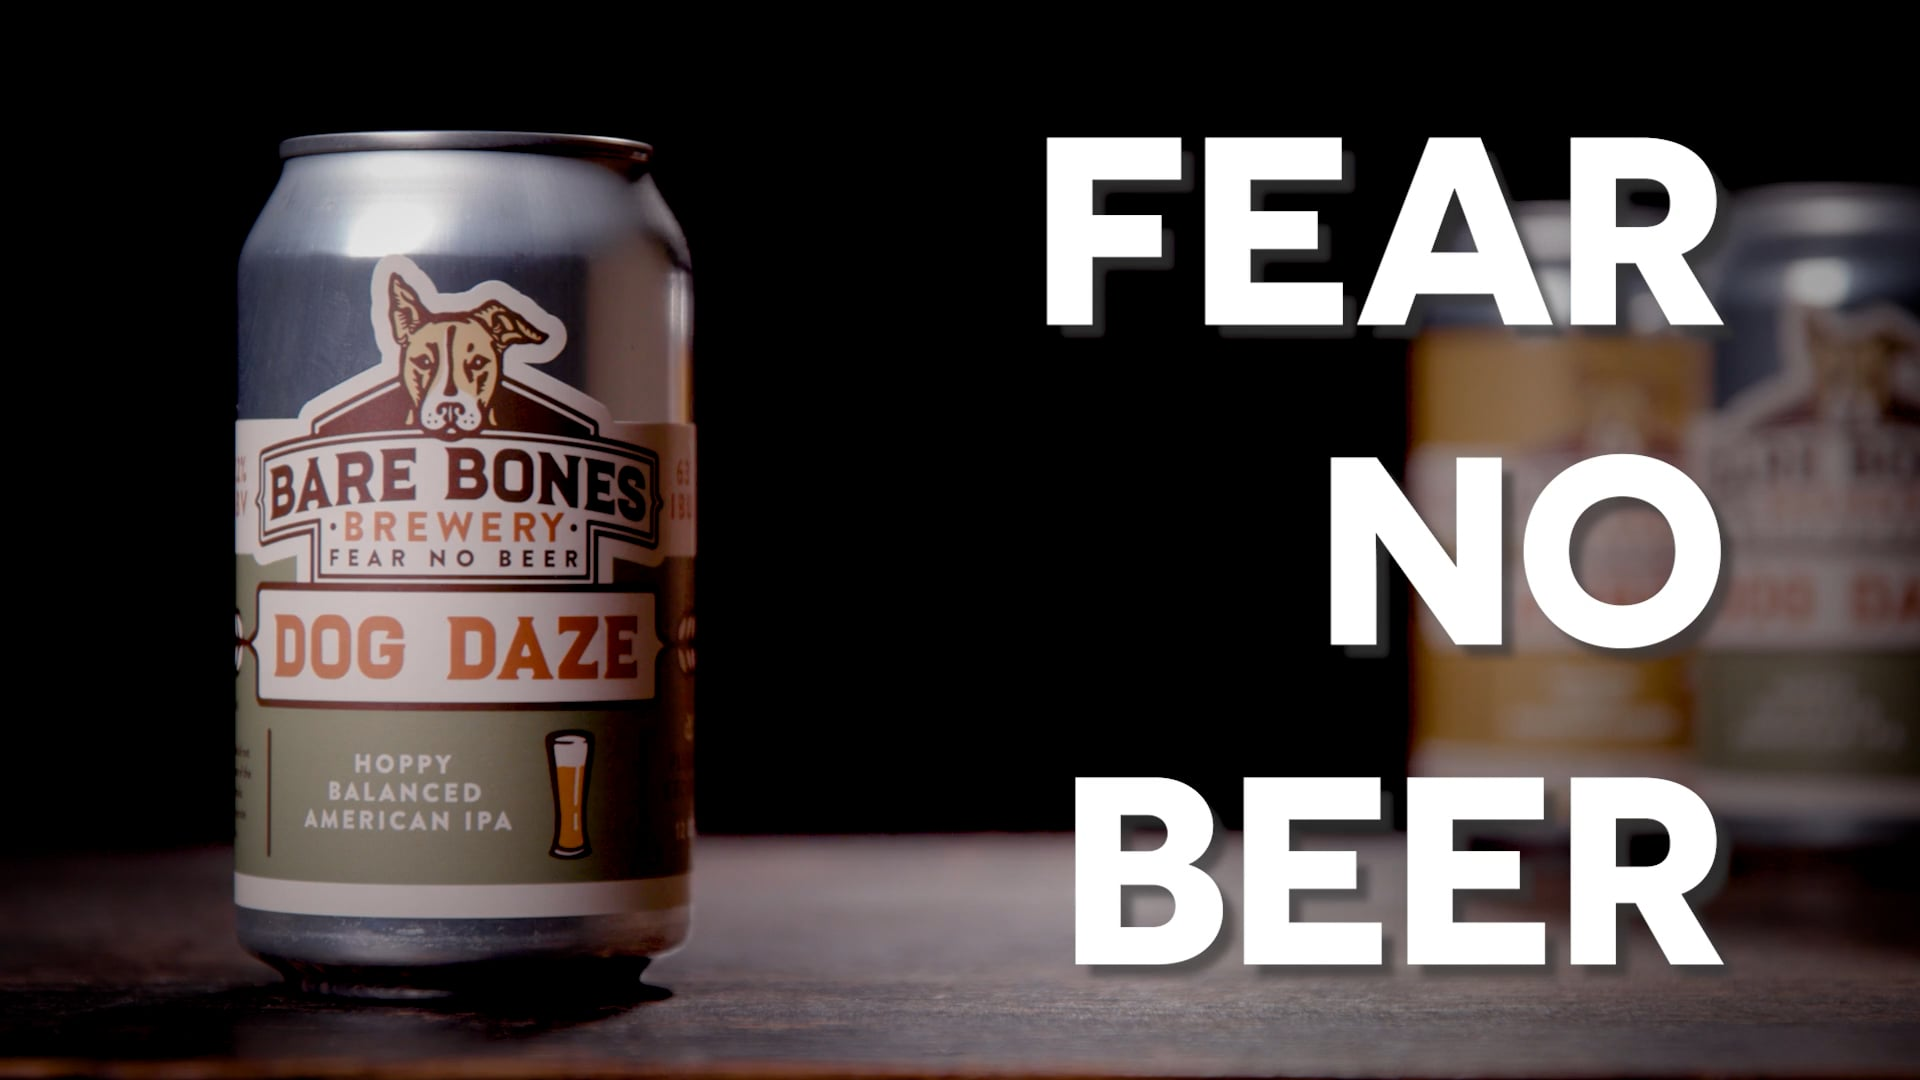 Bare Bones Brewery | Dog Daze